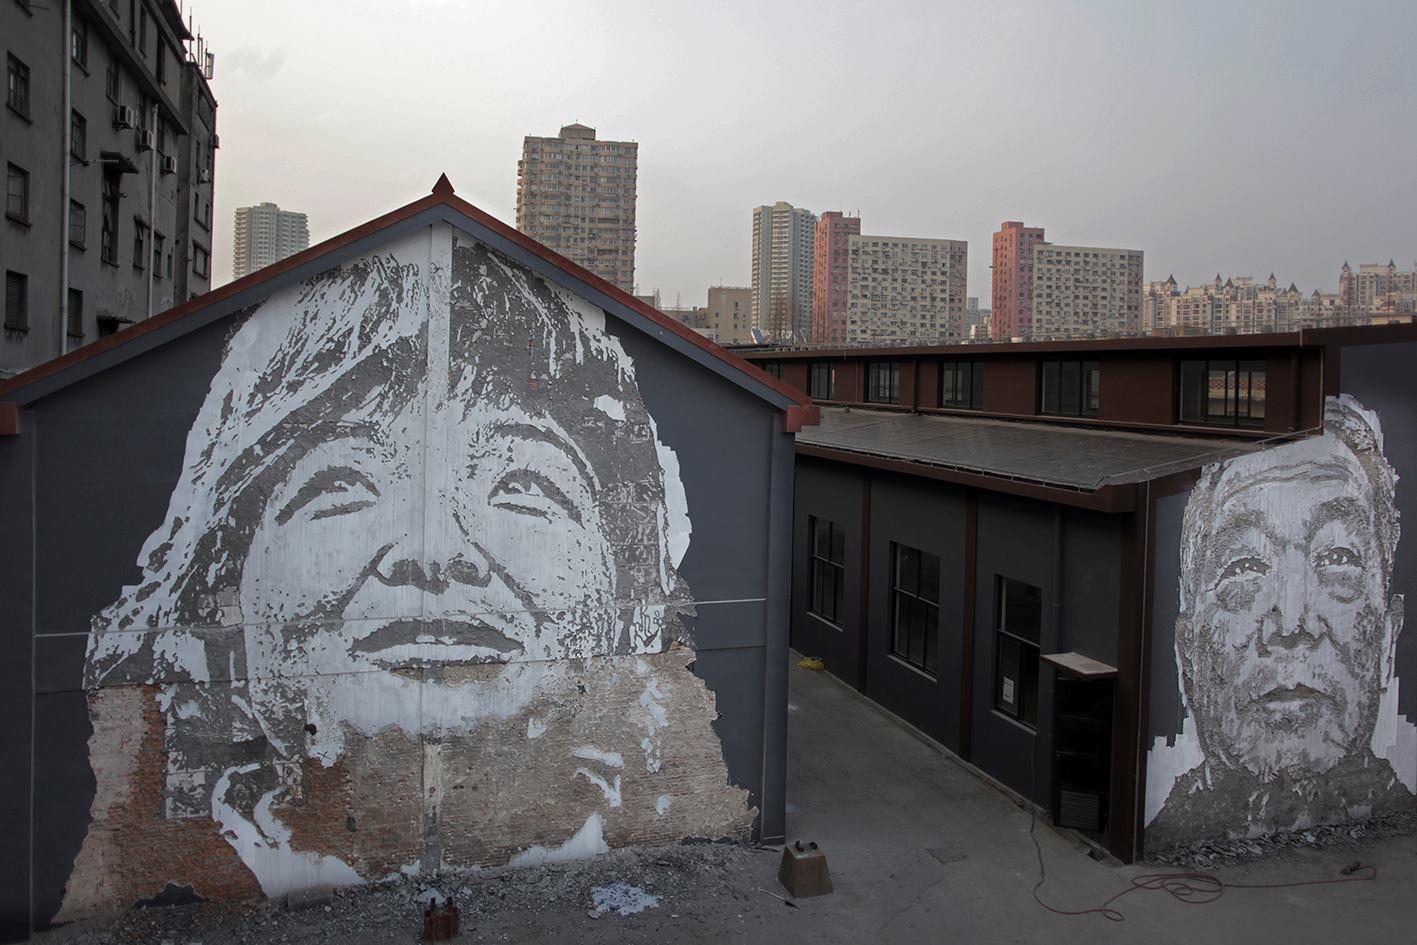 vhils graffiti escutura vandalismo dionisio arte (16)